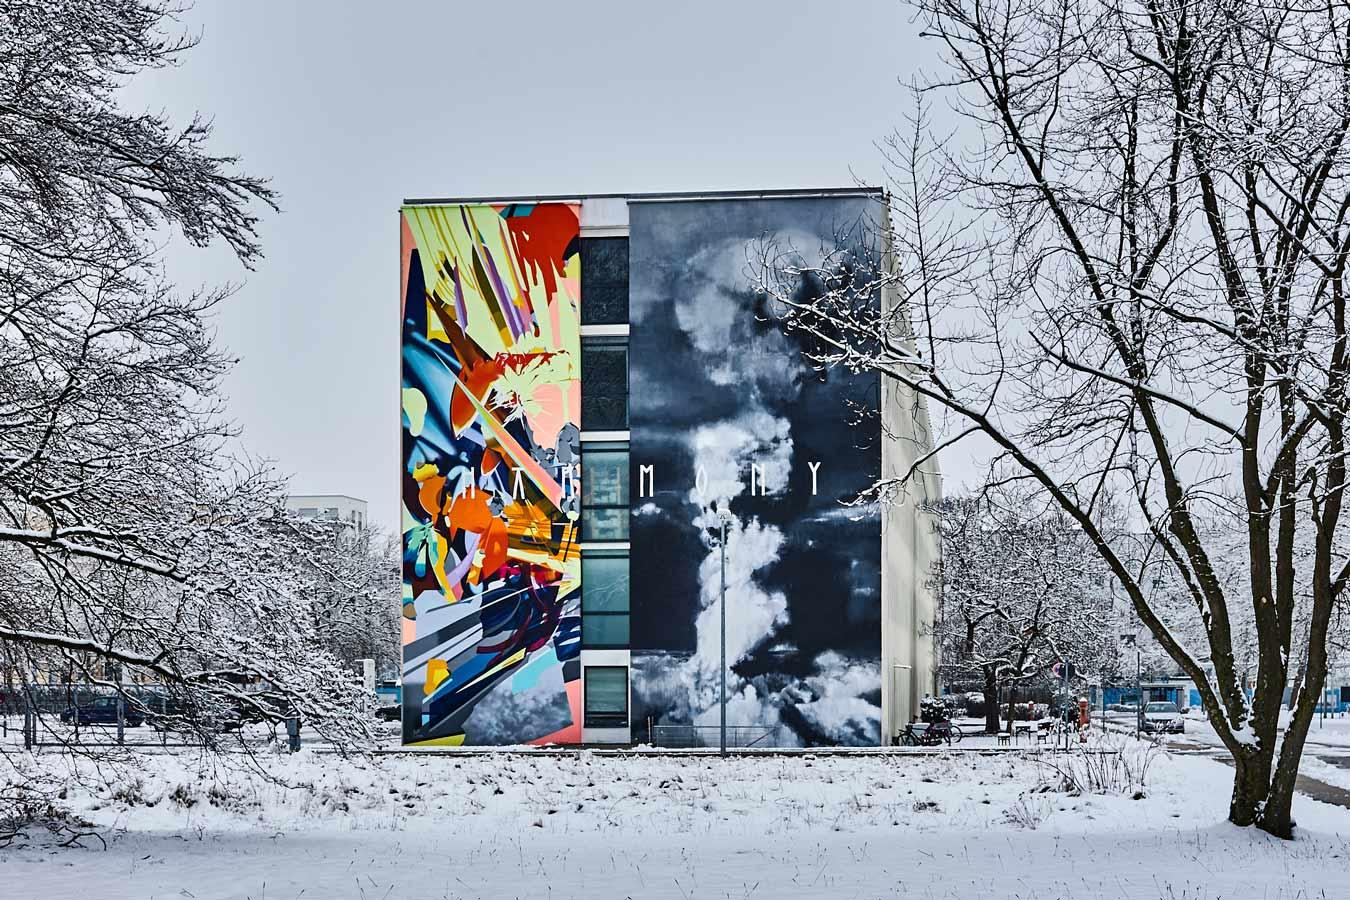 Scale-Street-Art-Siemens-Gelaende-Muenchen-2017--1